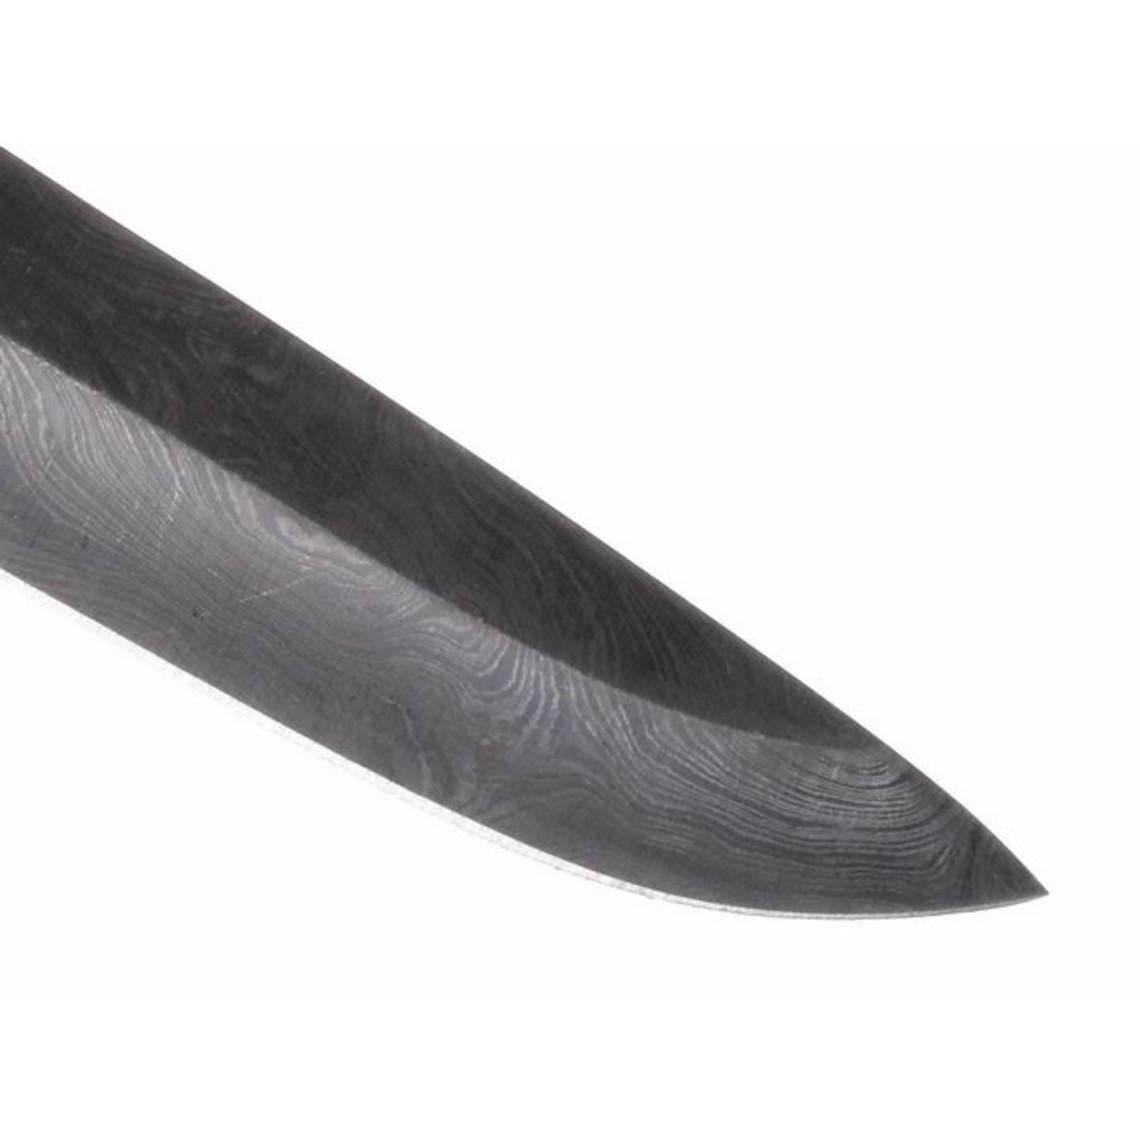 Messerklinge Damaststahl, 22 cm